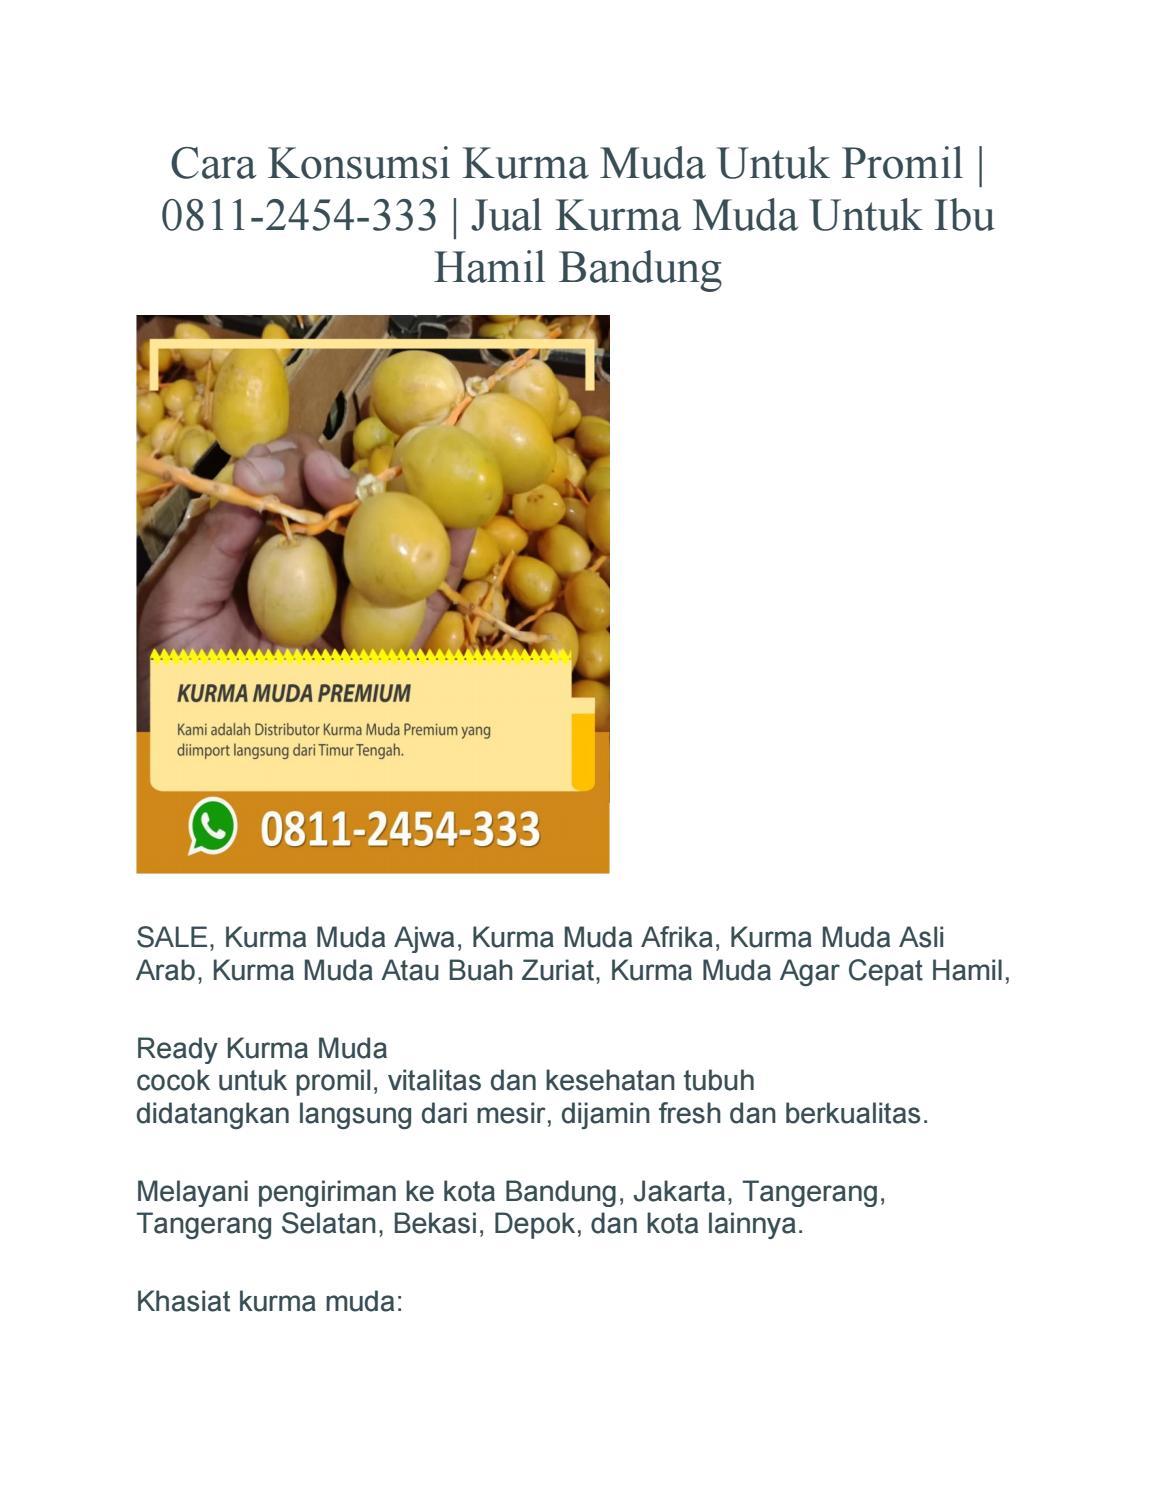 Cara Konsumsi Buah Zuriat : konsumsi, zuriat, Konsumsi, Kurma, Untuk, Promil, 0811-2454-333, Hamil, Bandung, Kurmamaniskiew, Issuu